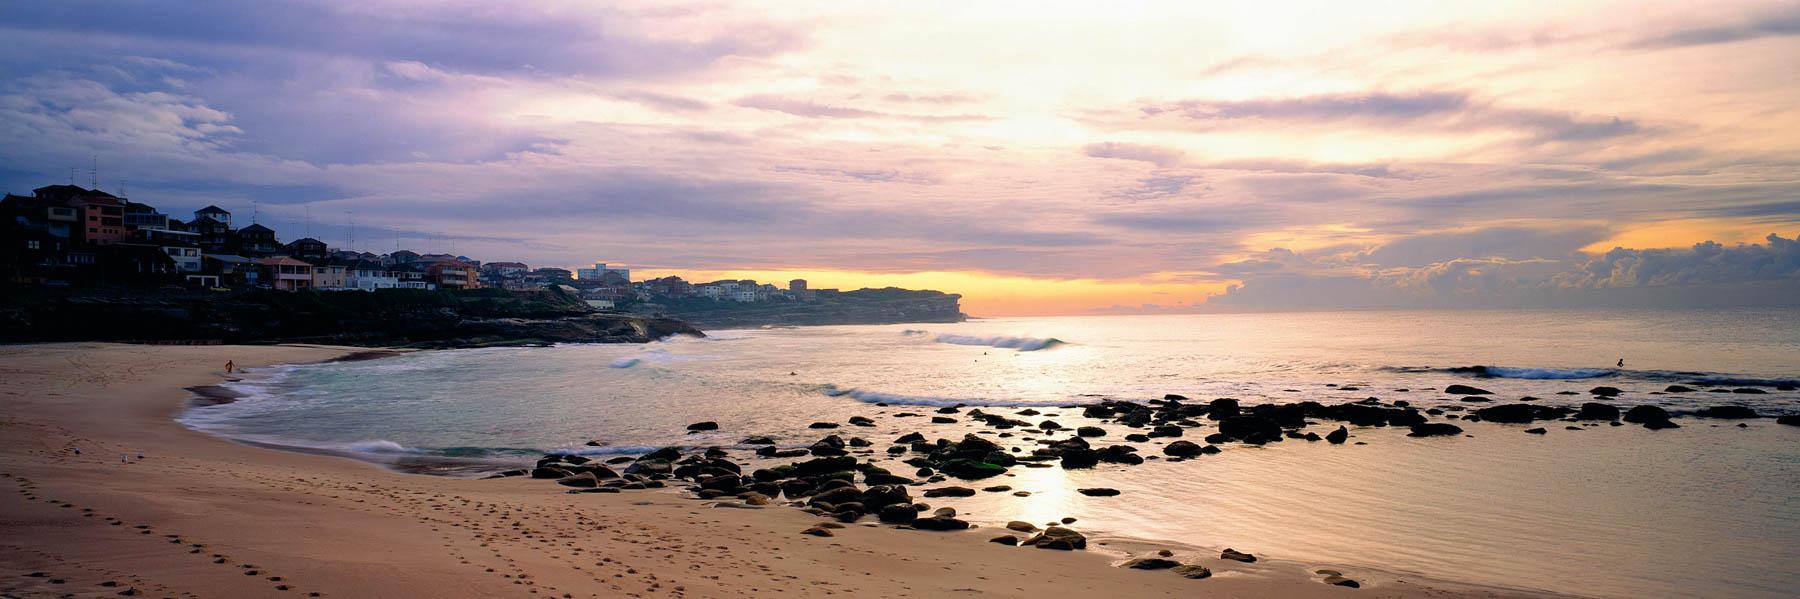 A pastel sunrise over Bronte Beach, Sydney, NSW, Australia.